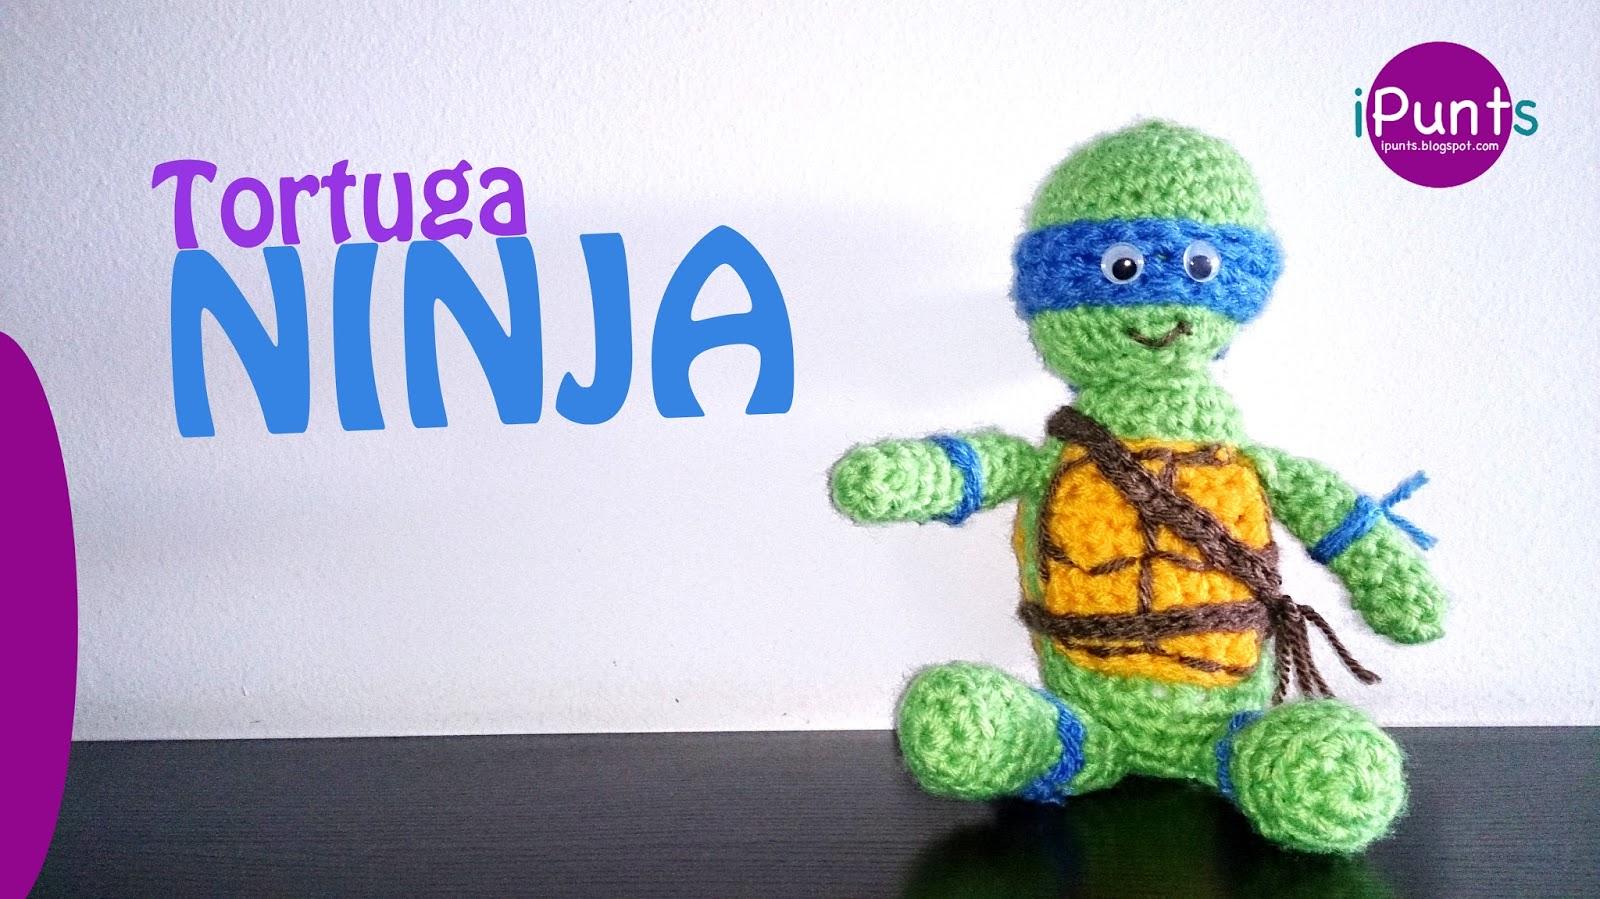 Amigurumi Tortuga Ninja Paso A Paso : iPunts